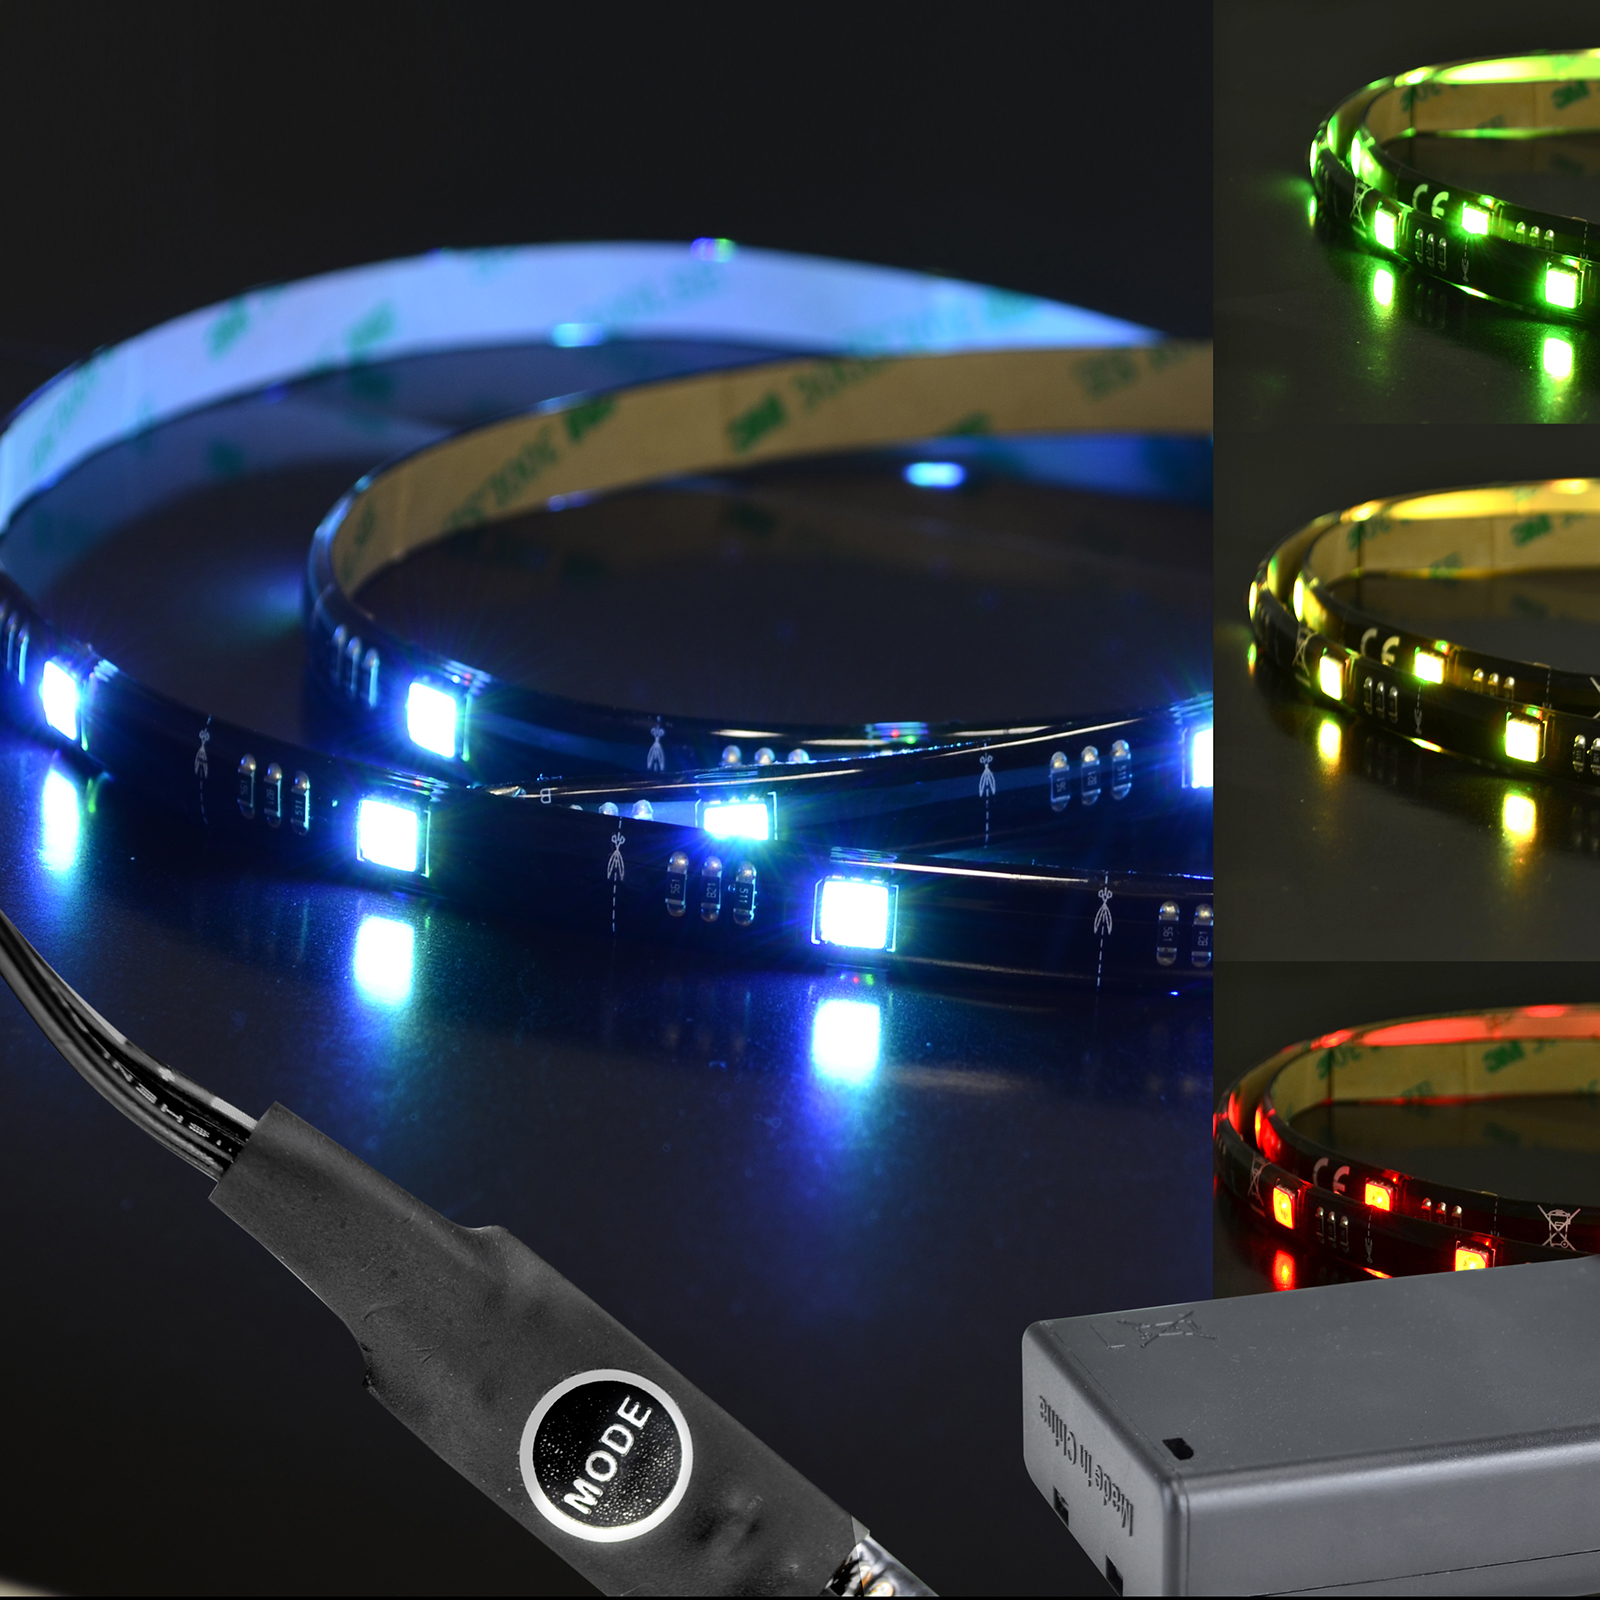 Berühmt X4-LIFE RGB LED Band 1m SMD5050 Batterie / Selbstklebend / IP65 FJ44